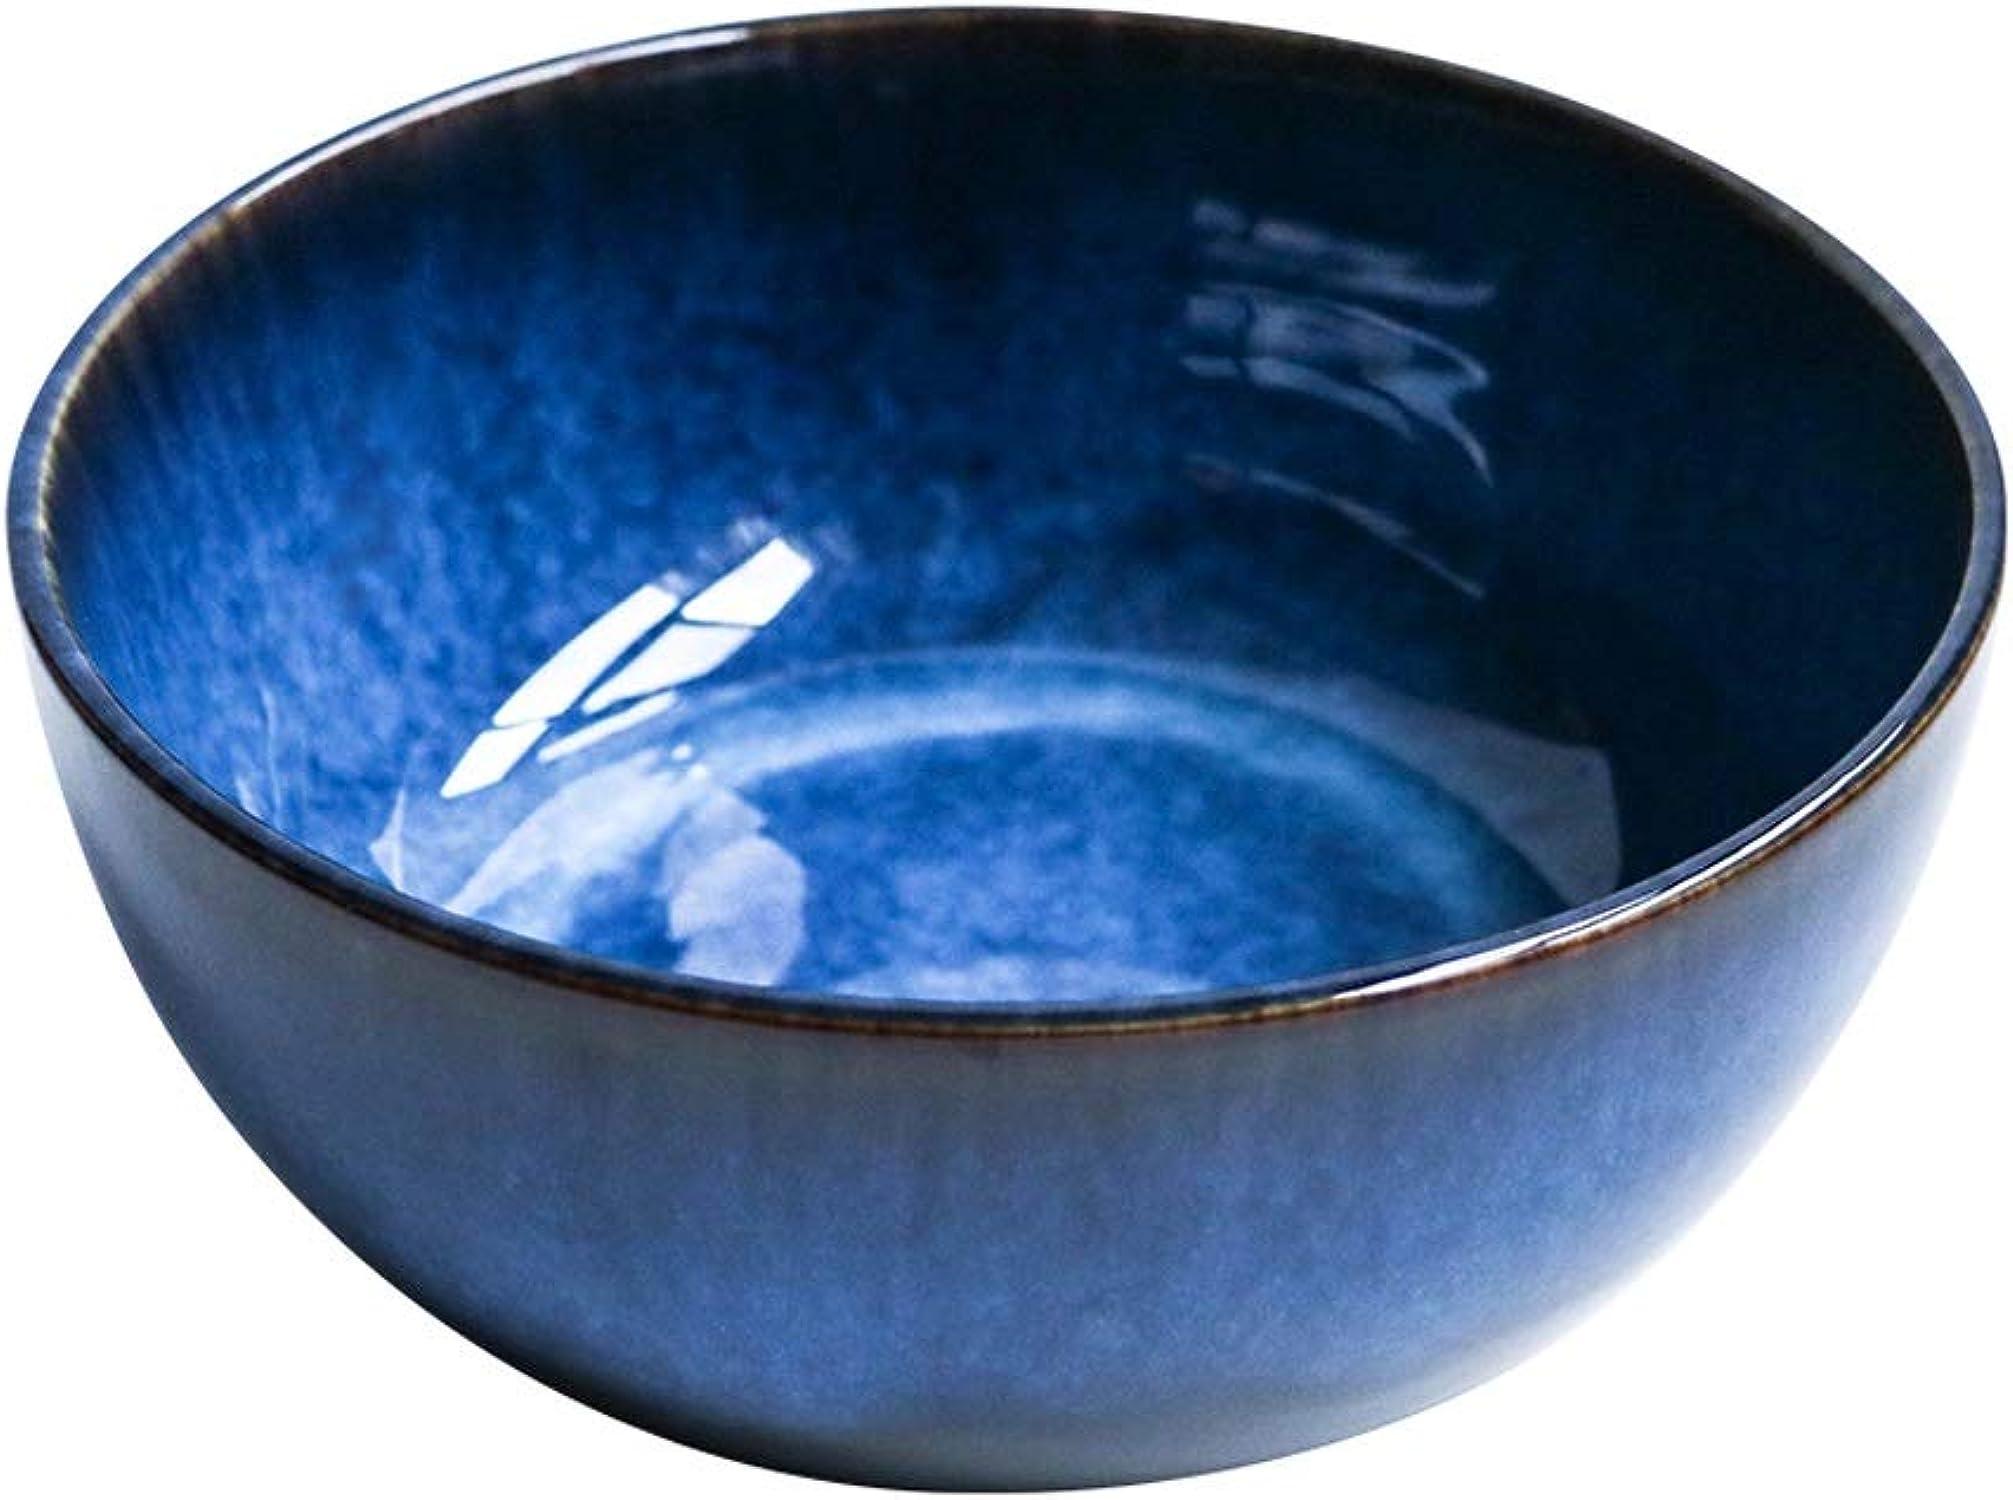 XuQinQin Ménage japonais grand bol bol à salade créatif grand bol en céramique bol à soupe bol bassin bol de vaisselle rétro bol ménage bol